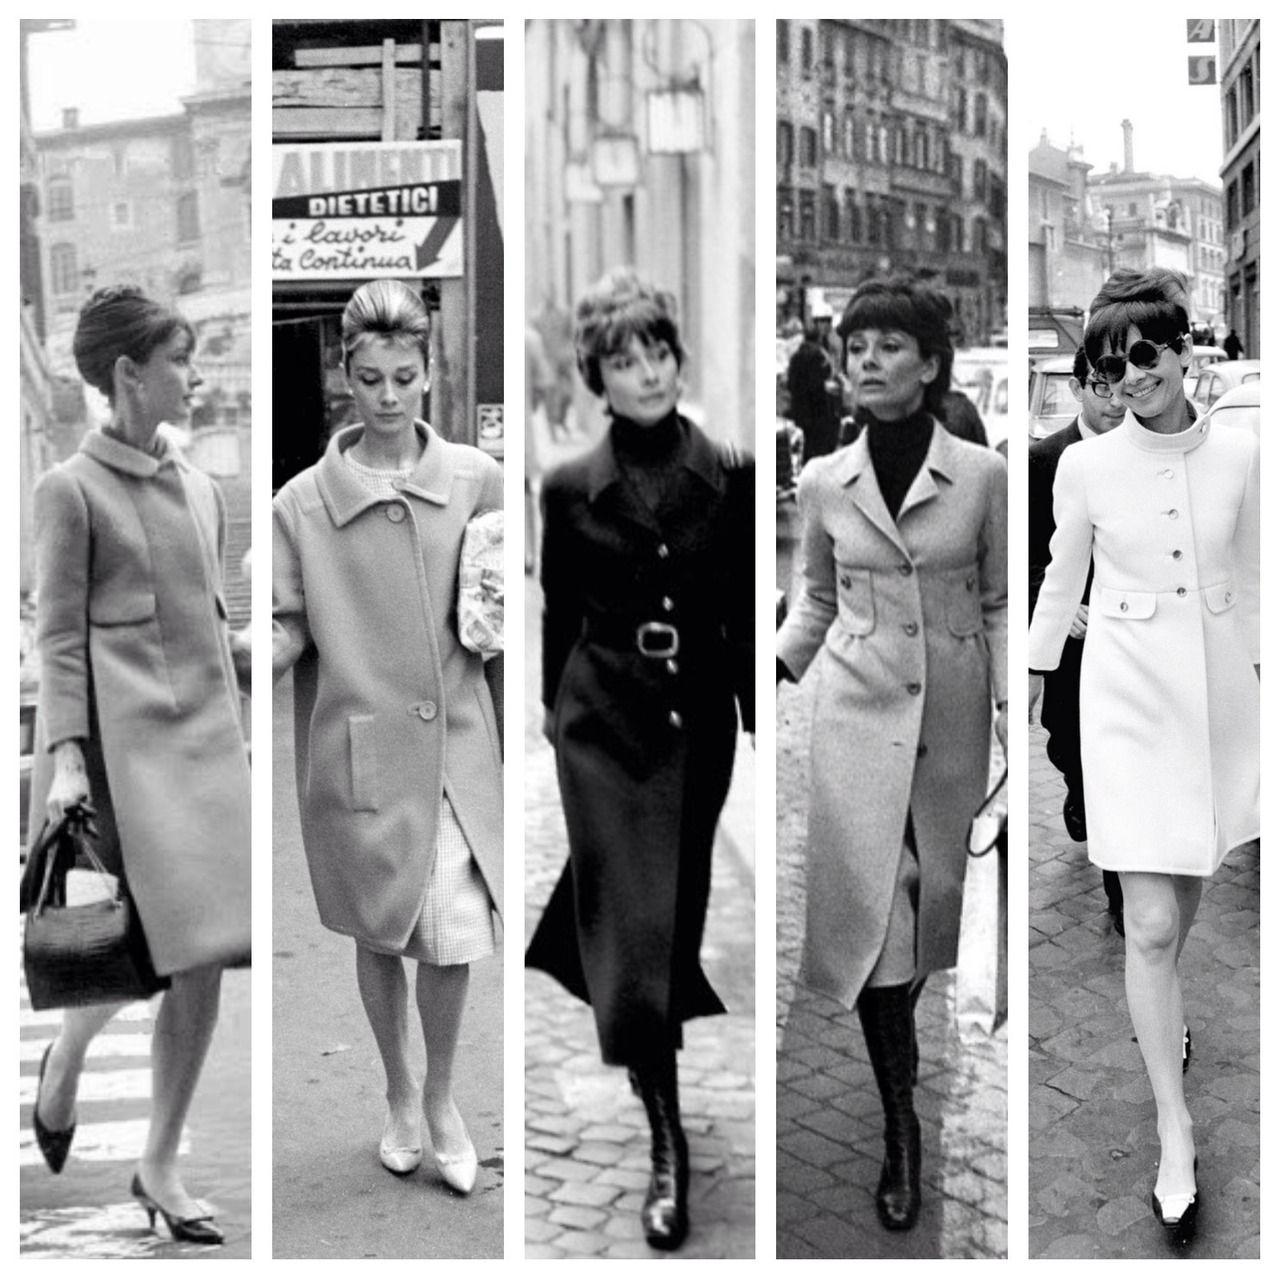 Audrey Hepburn in Rome | Audrey Hepburn | Audrey hepburn ...